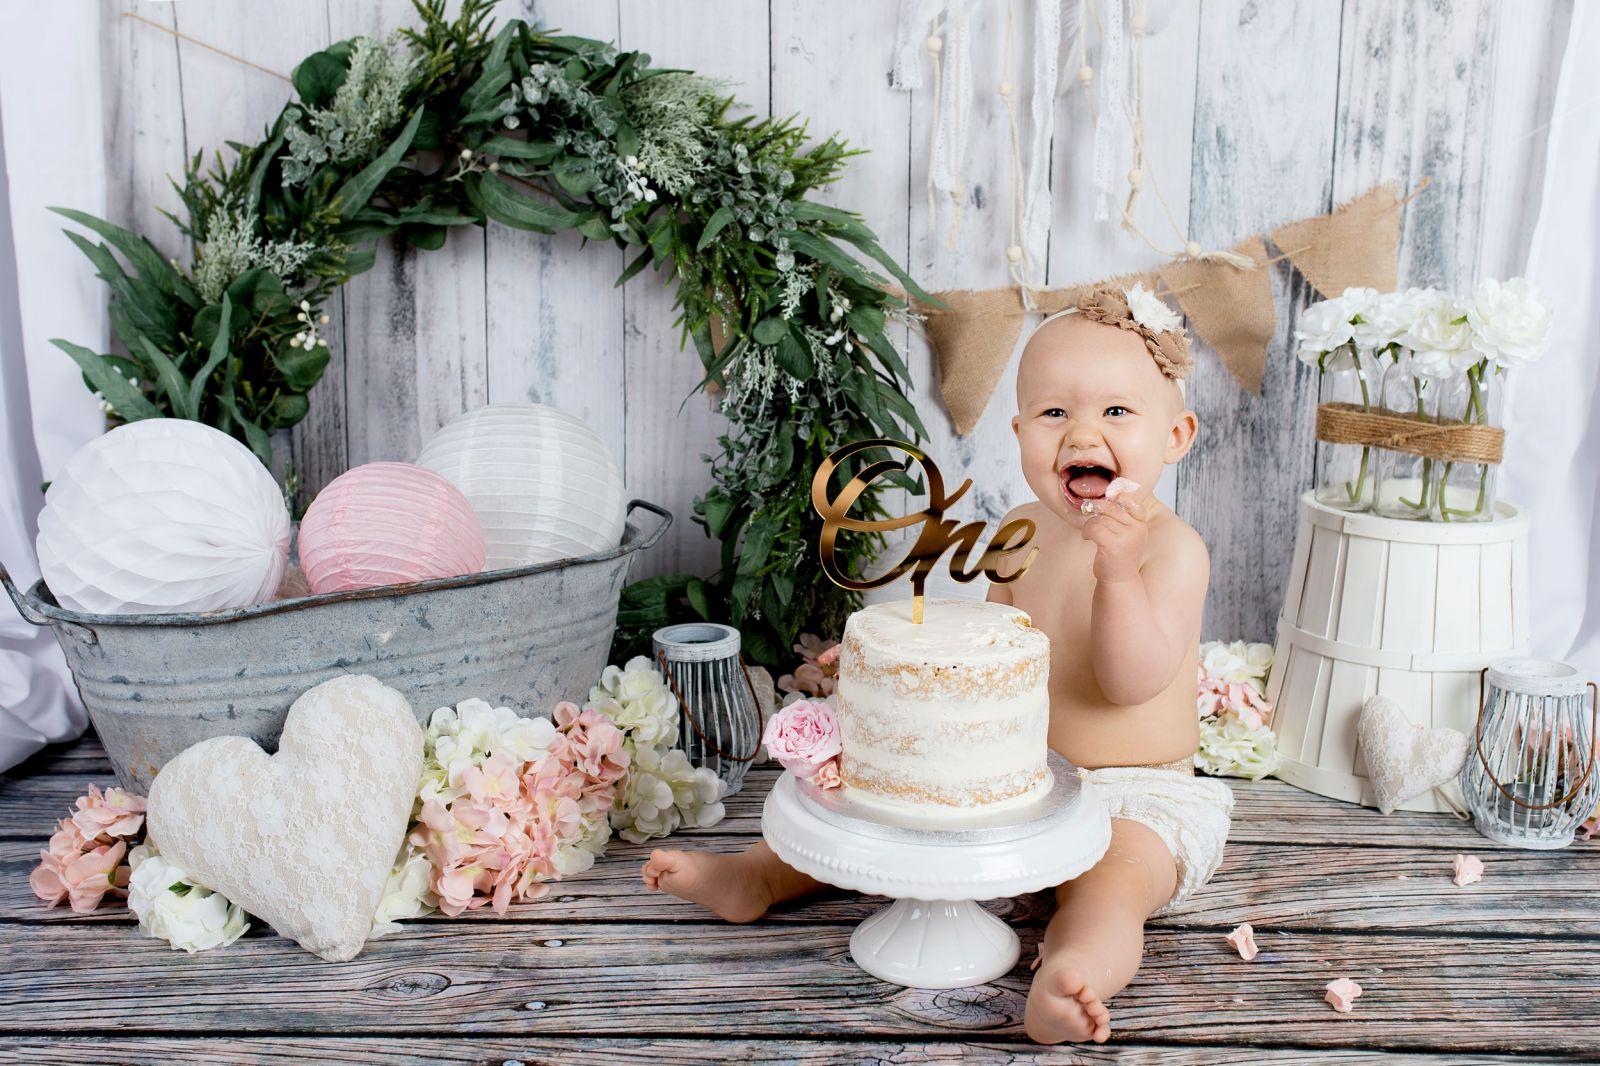 séance photos smash the cake bébé studio